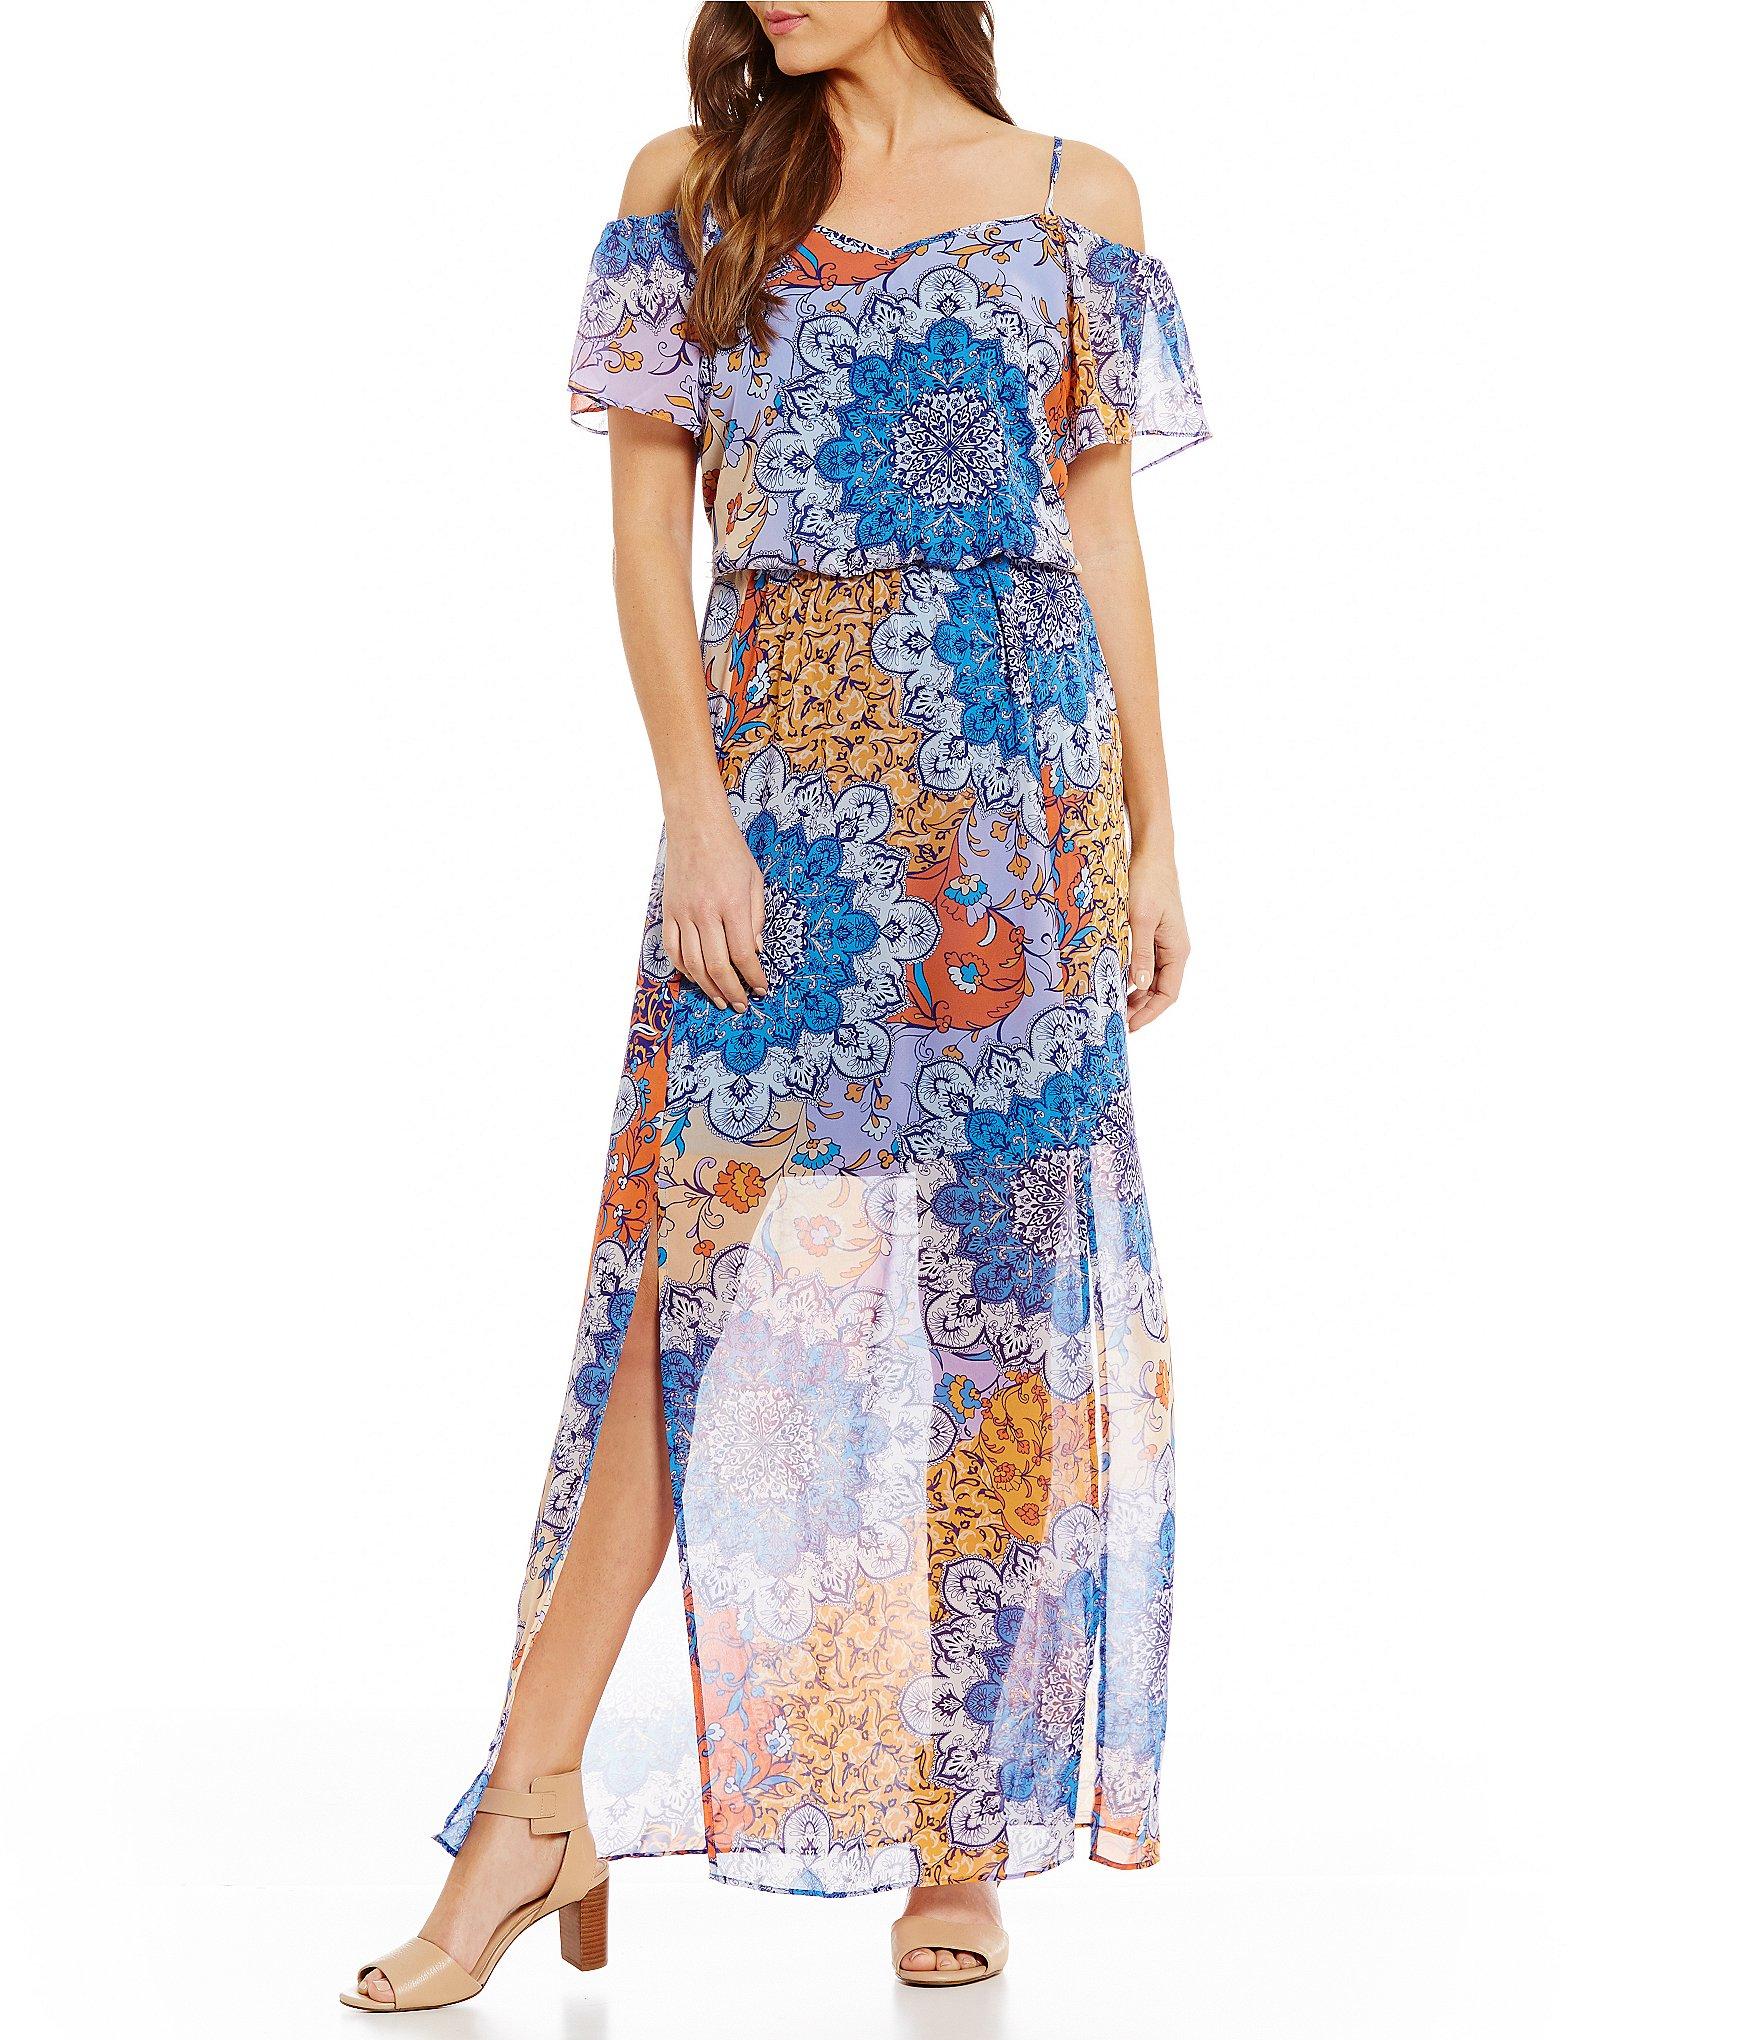 Piccolina maxi dress by leifsdottir dresses